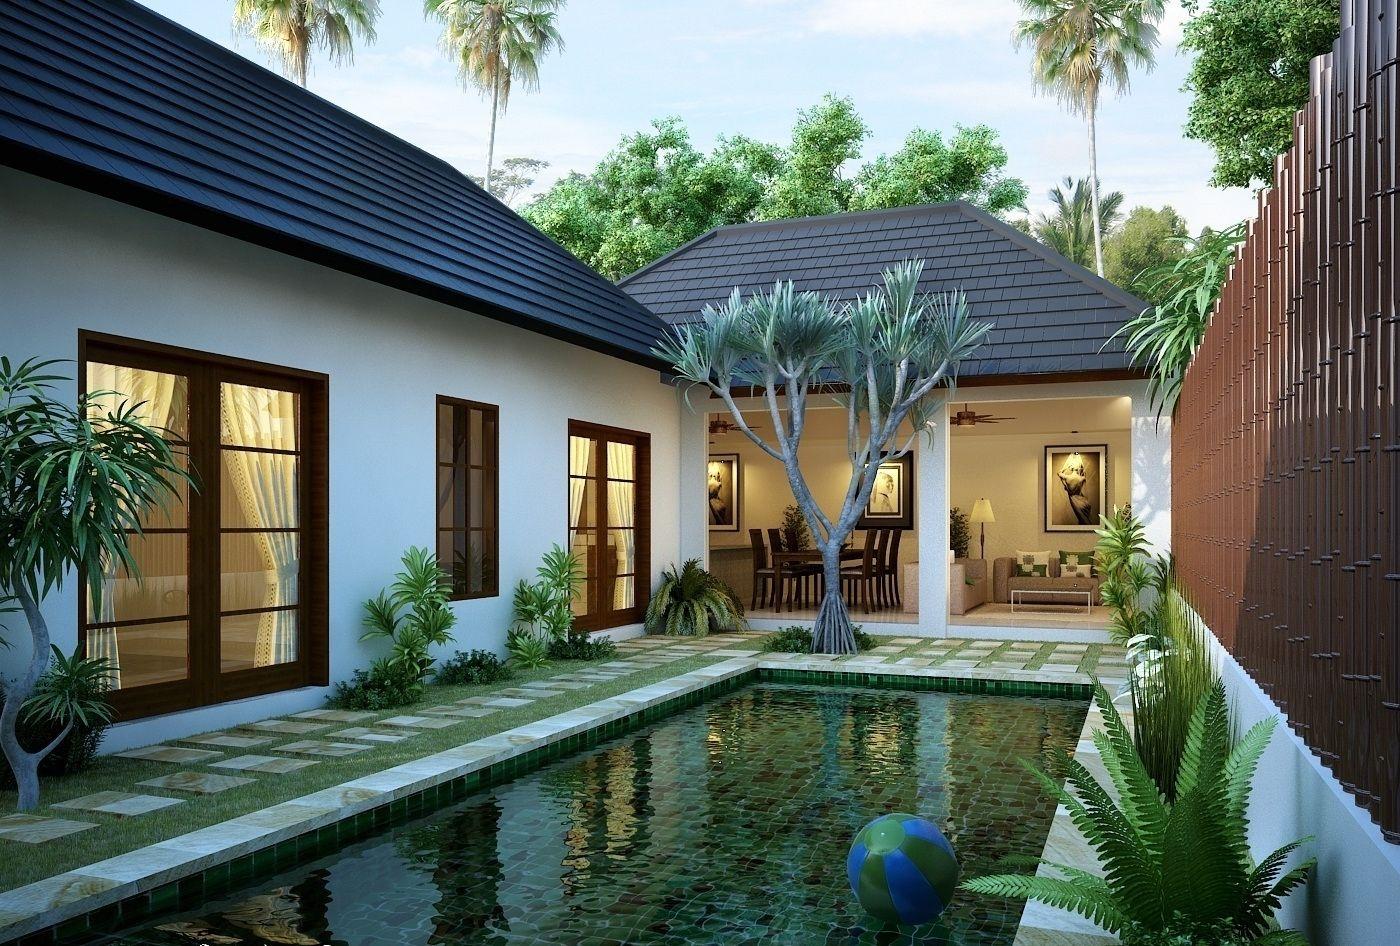 Beautiful Modern Tropical Exterior House Design 2014 ...